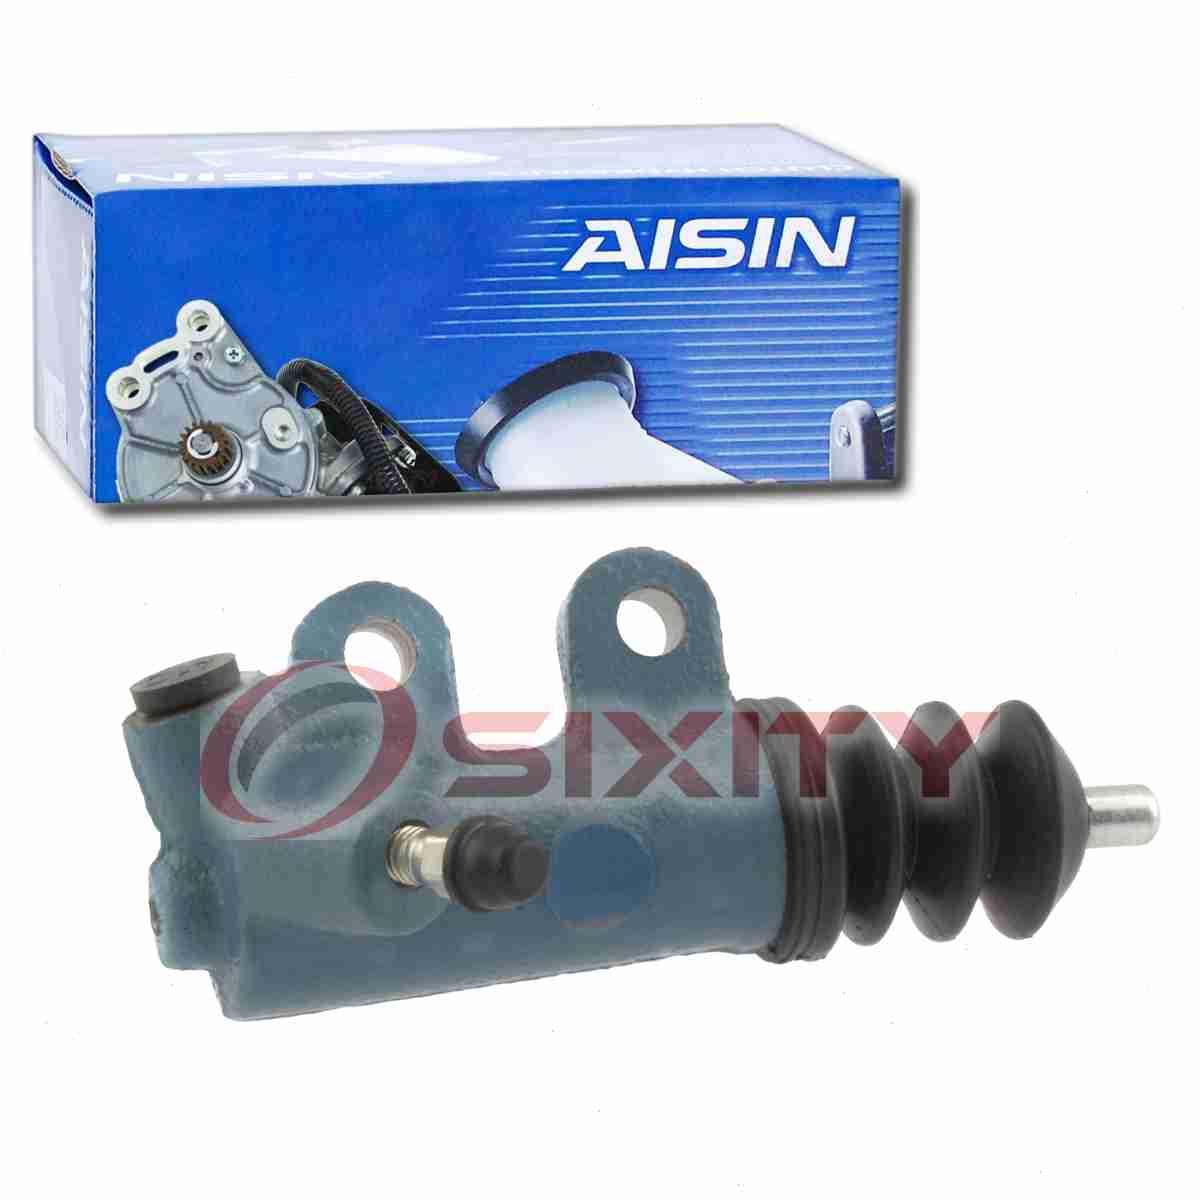 AISIN Clutch Slave Cylinder for 1987-2001 Toyota Camry 2.0L 2.2L 2.5L 3.0L pr